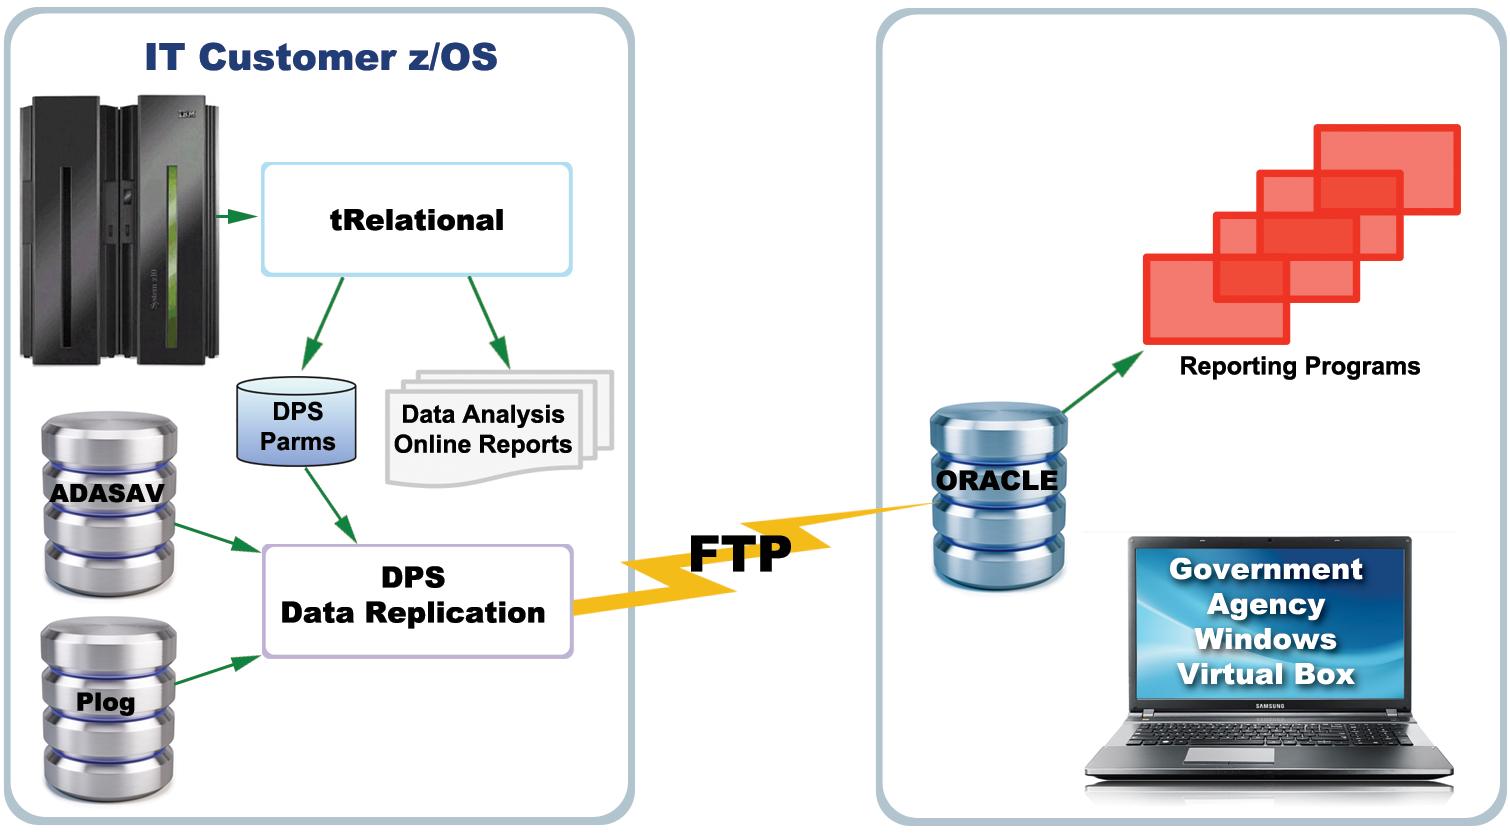 _0_tReDPS_Replication_Scenario